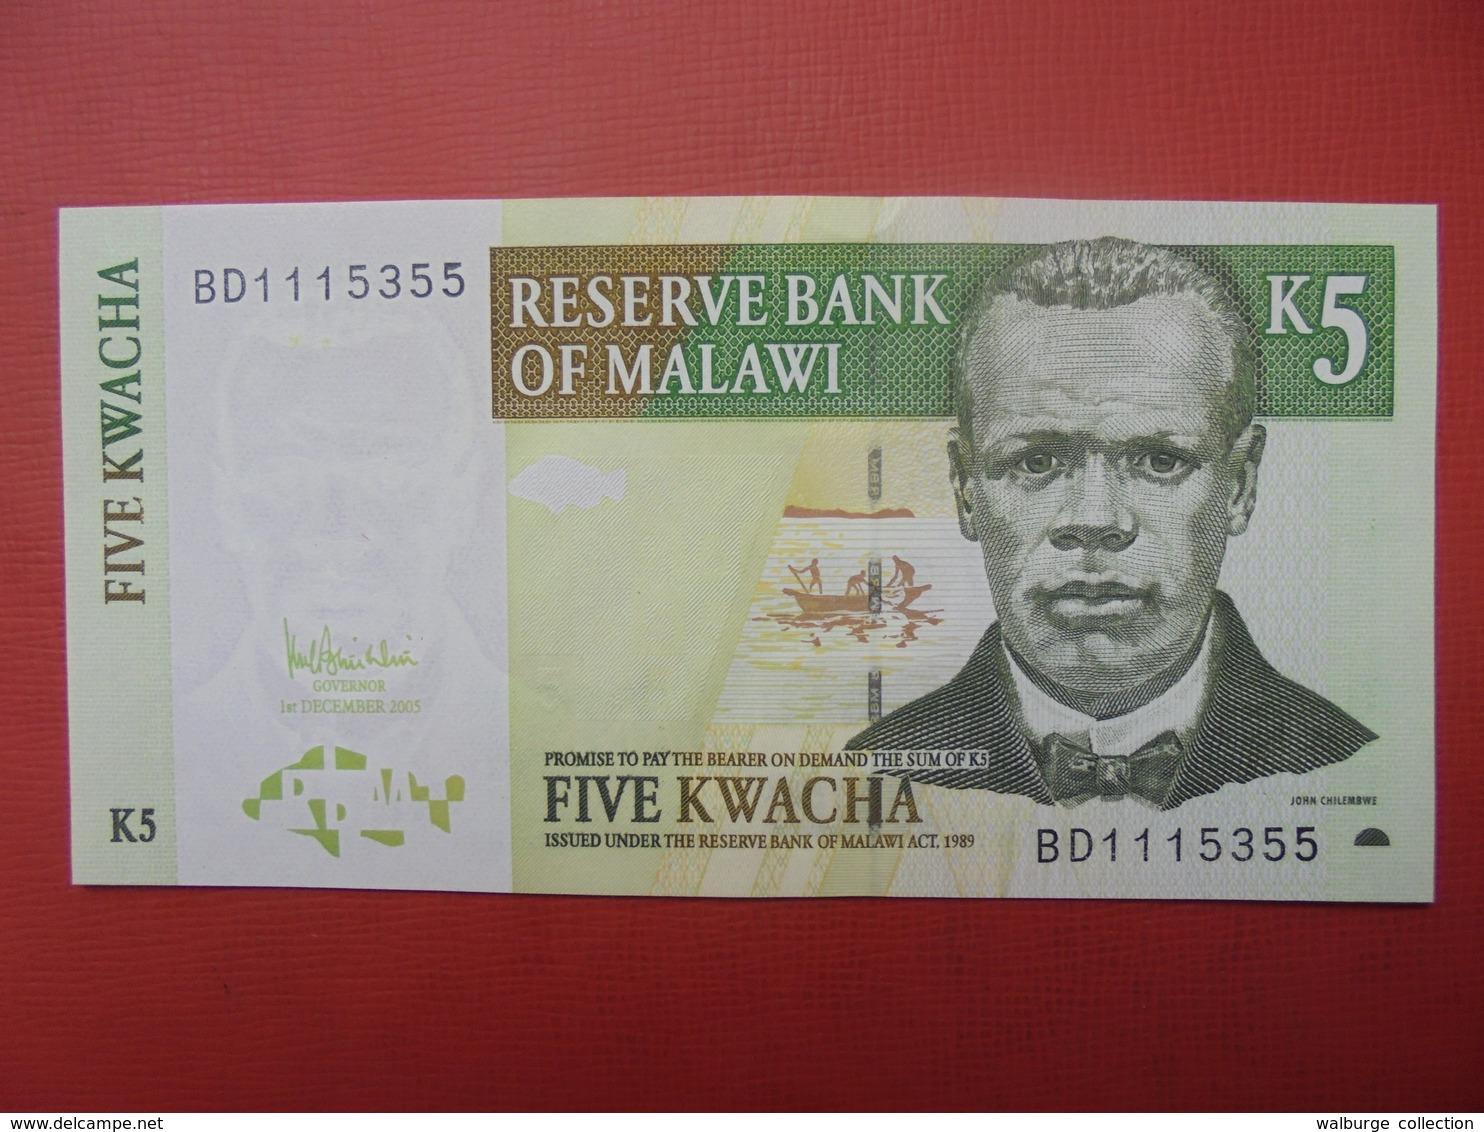 MALAWI 5 KWACHA 1997-2005 PEU CIRCULER/NEUF - Malawi